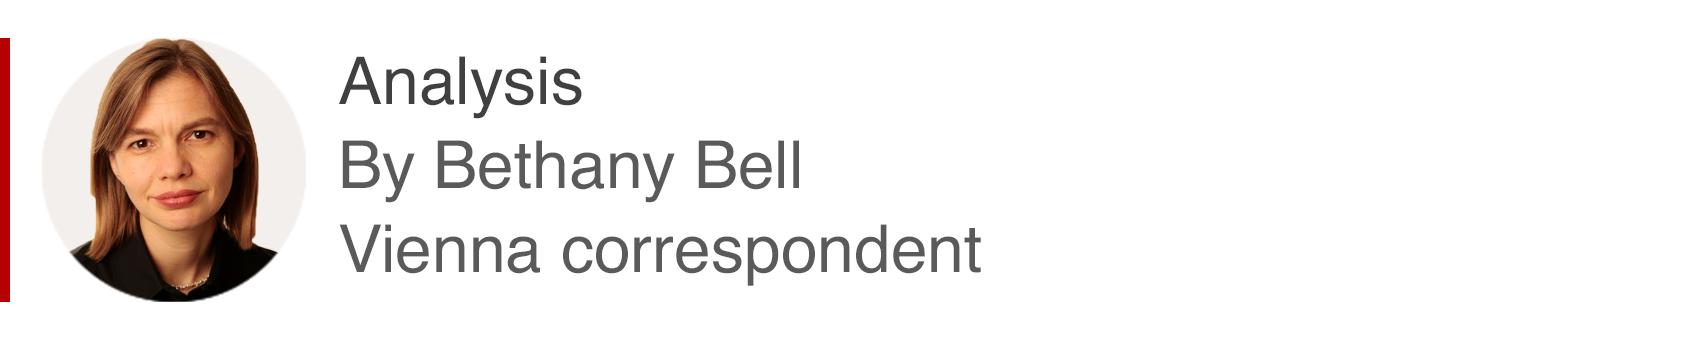 Bethany Bell